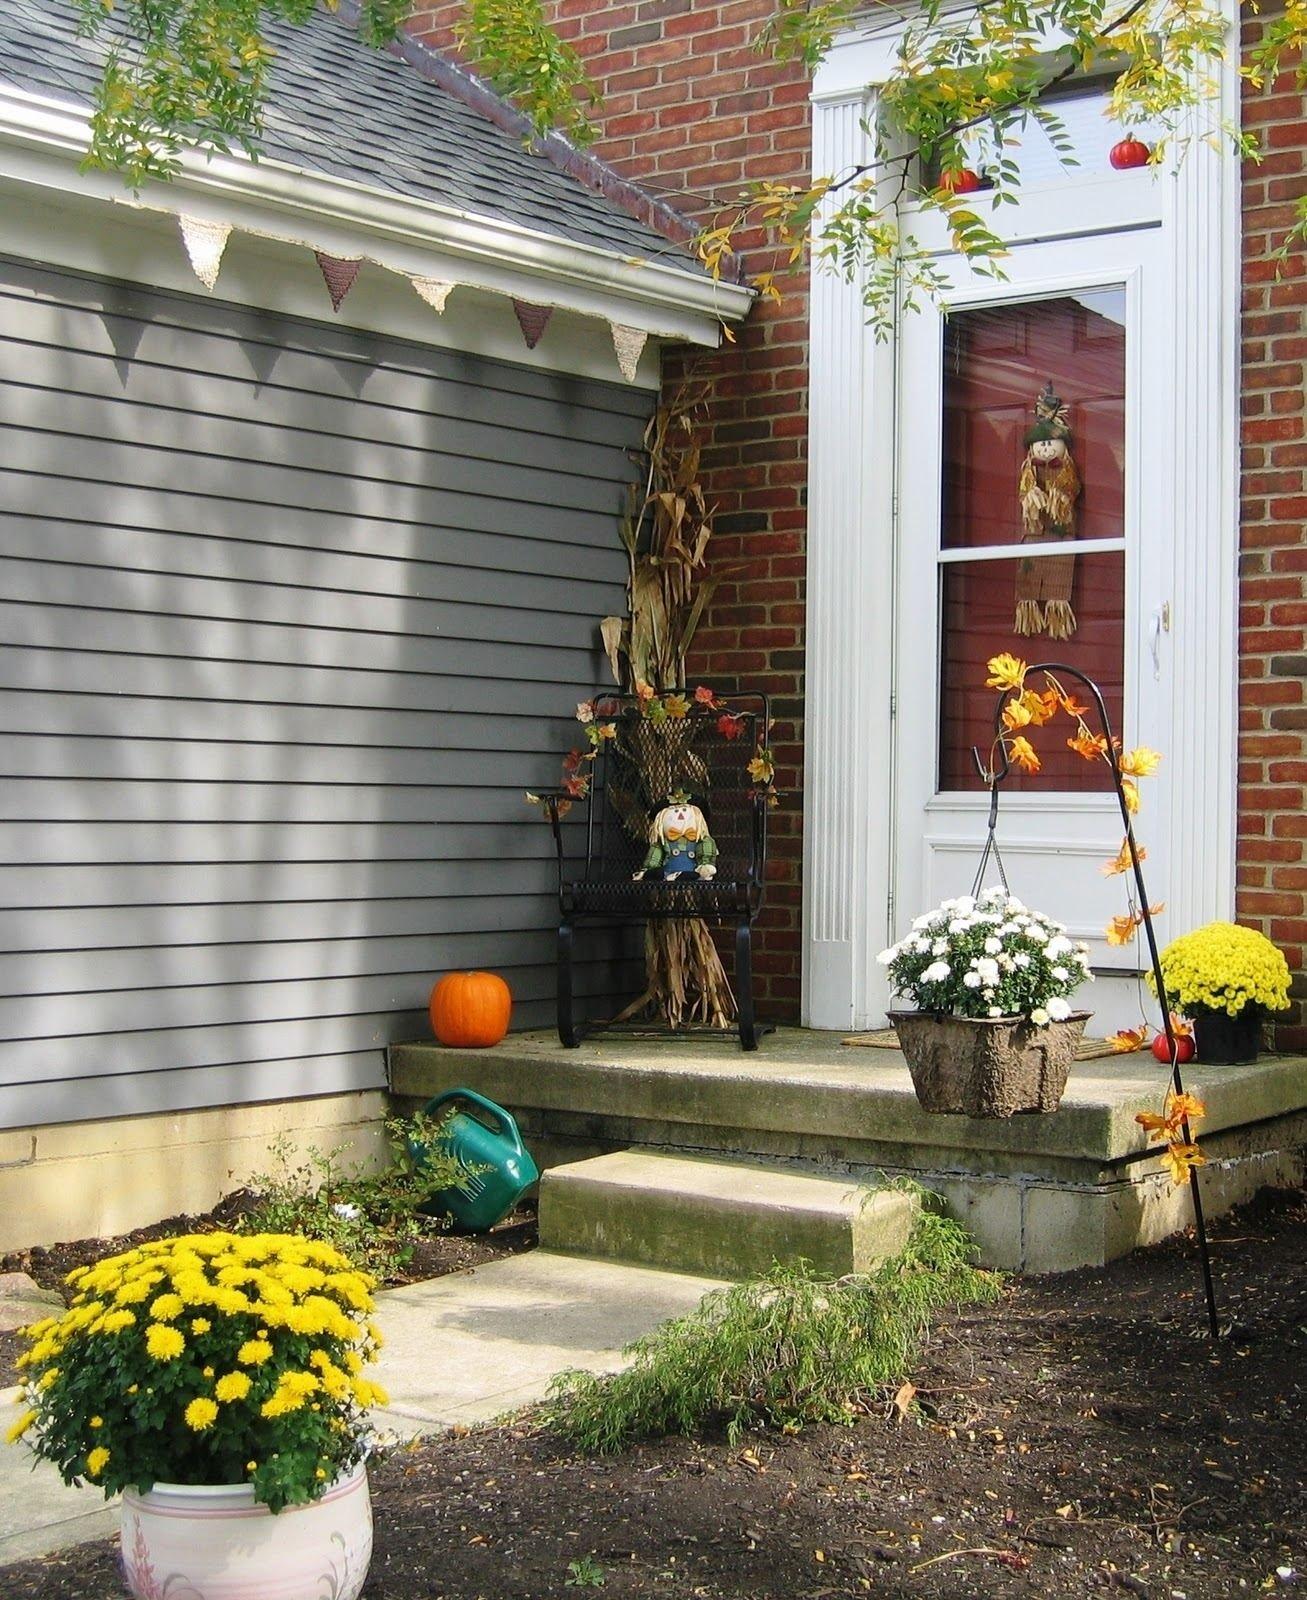 10 Elegant Small Front Porch Decorating Ideas small back porch ideas marvellous small front porch decorating 2021